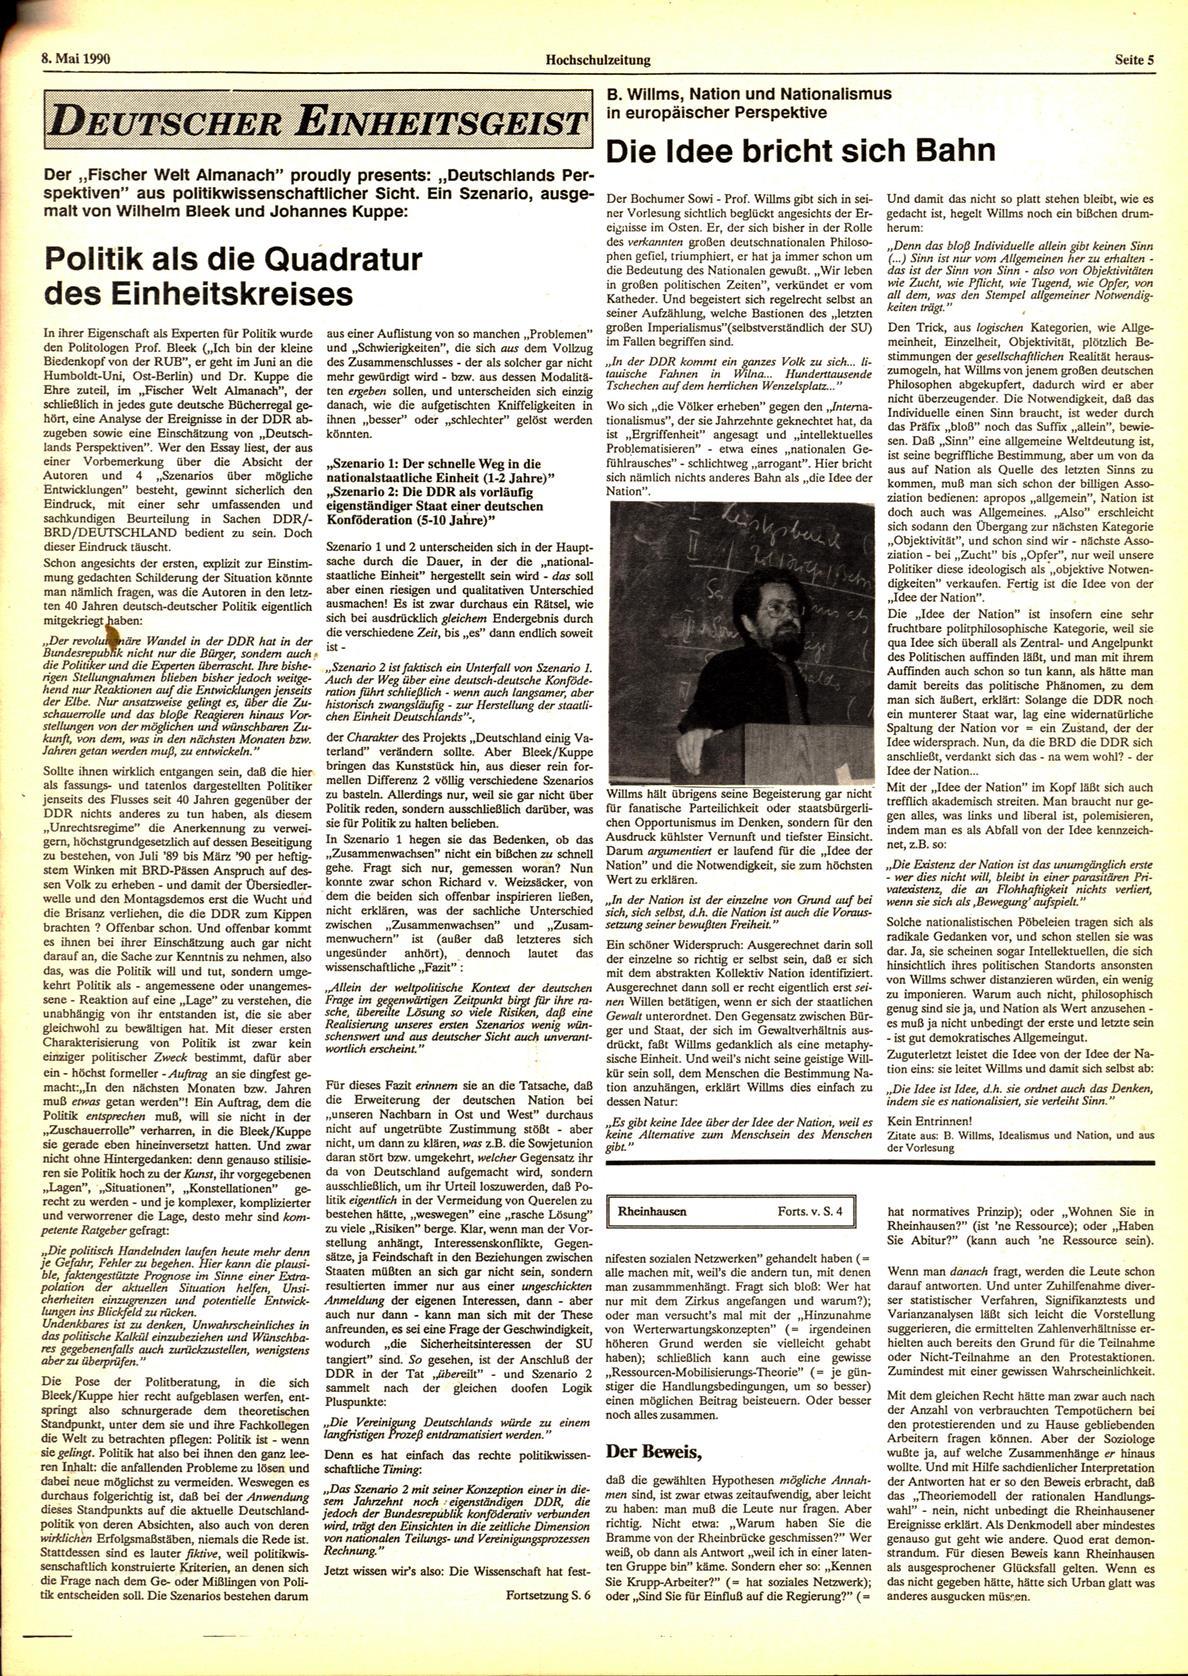 Bochum_BHZ_19900508_005